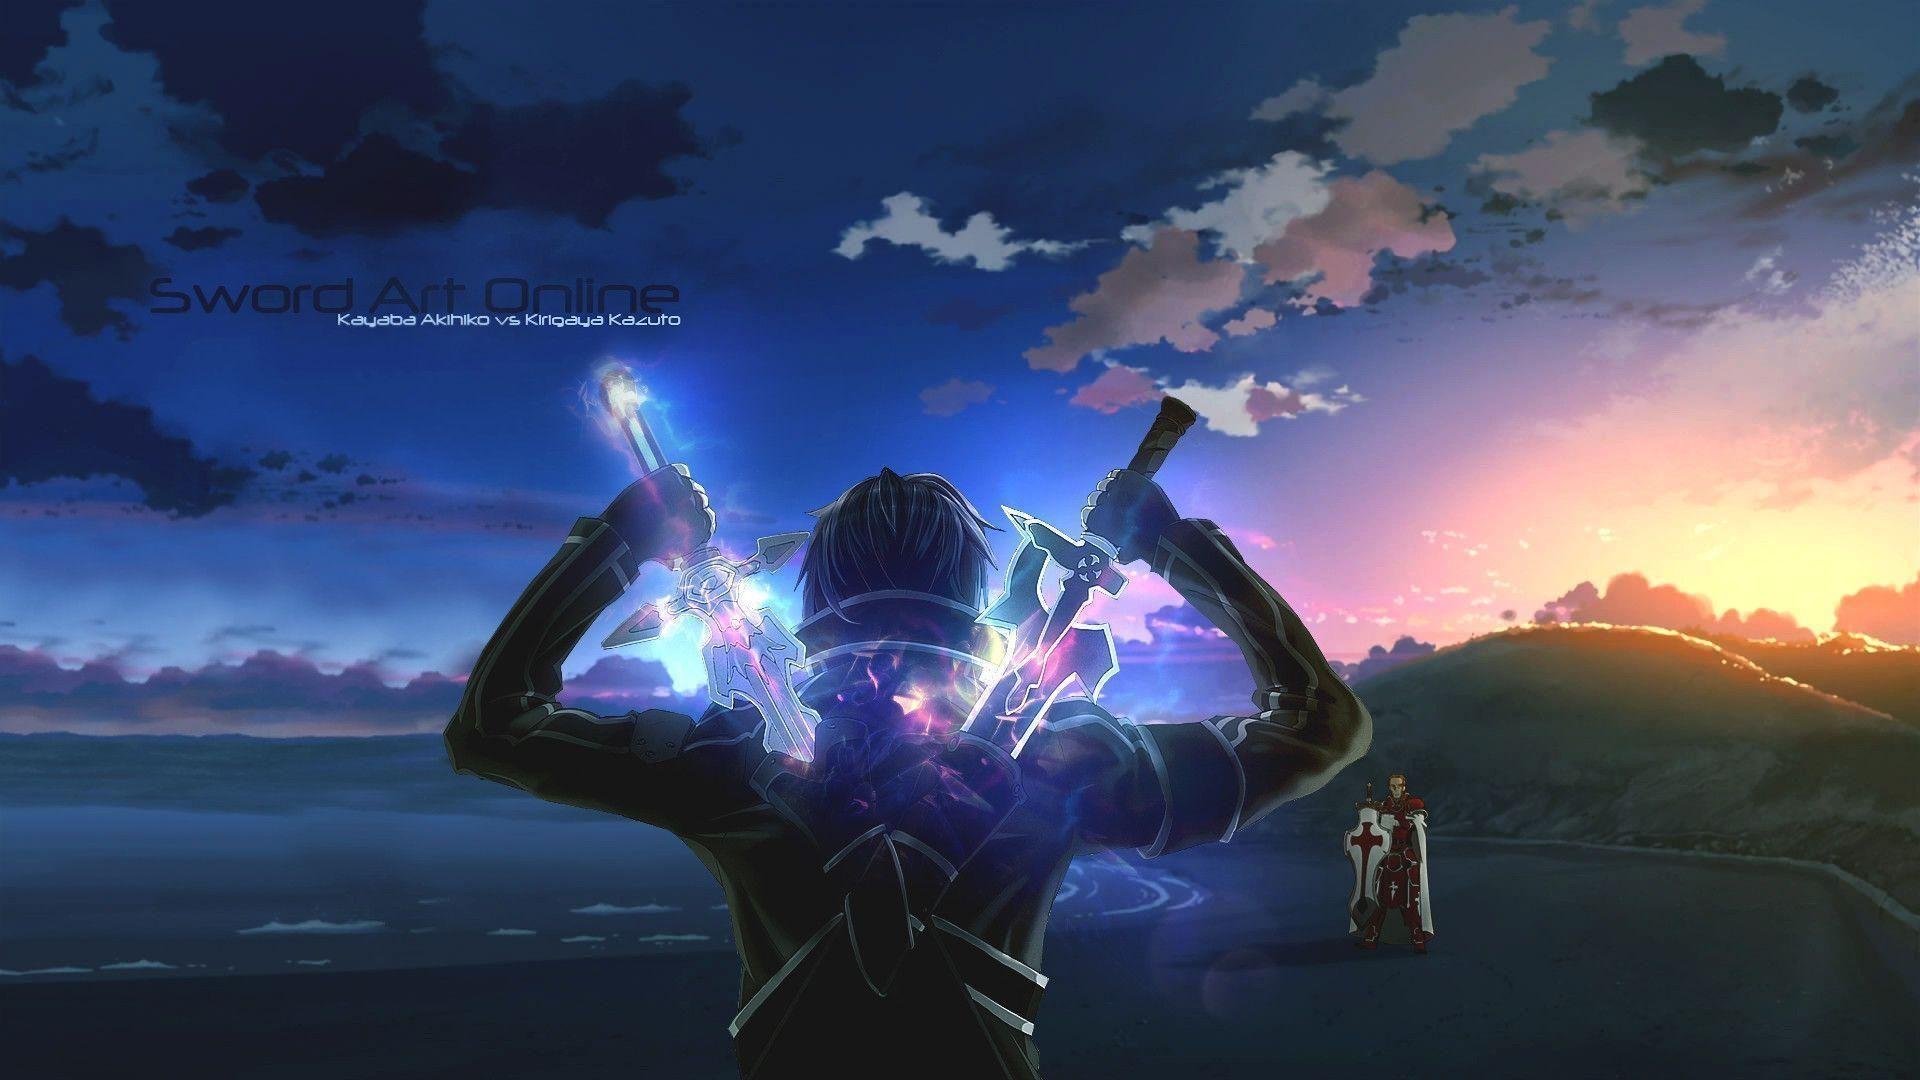 Epic Anime Images On Wallpaper 1080p Hd Sword Art Online Wallpaper Sword Art Online Kirito Sword Art